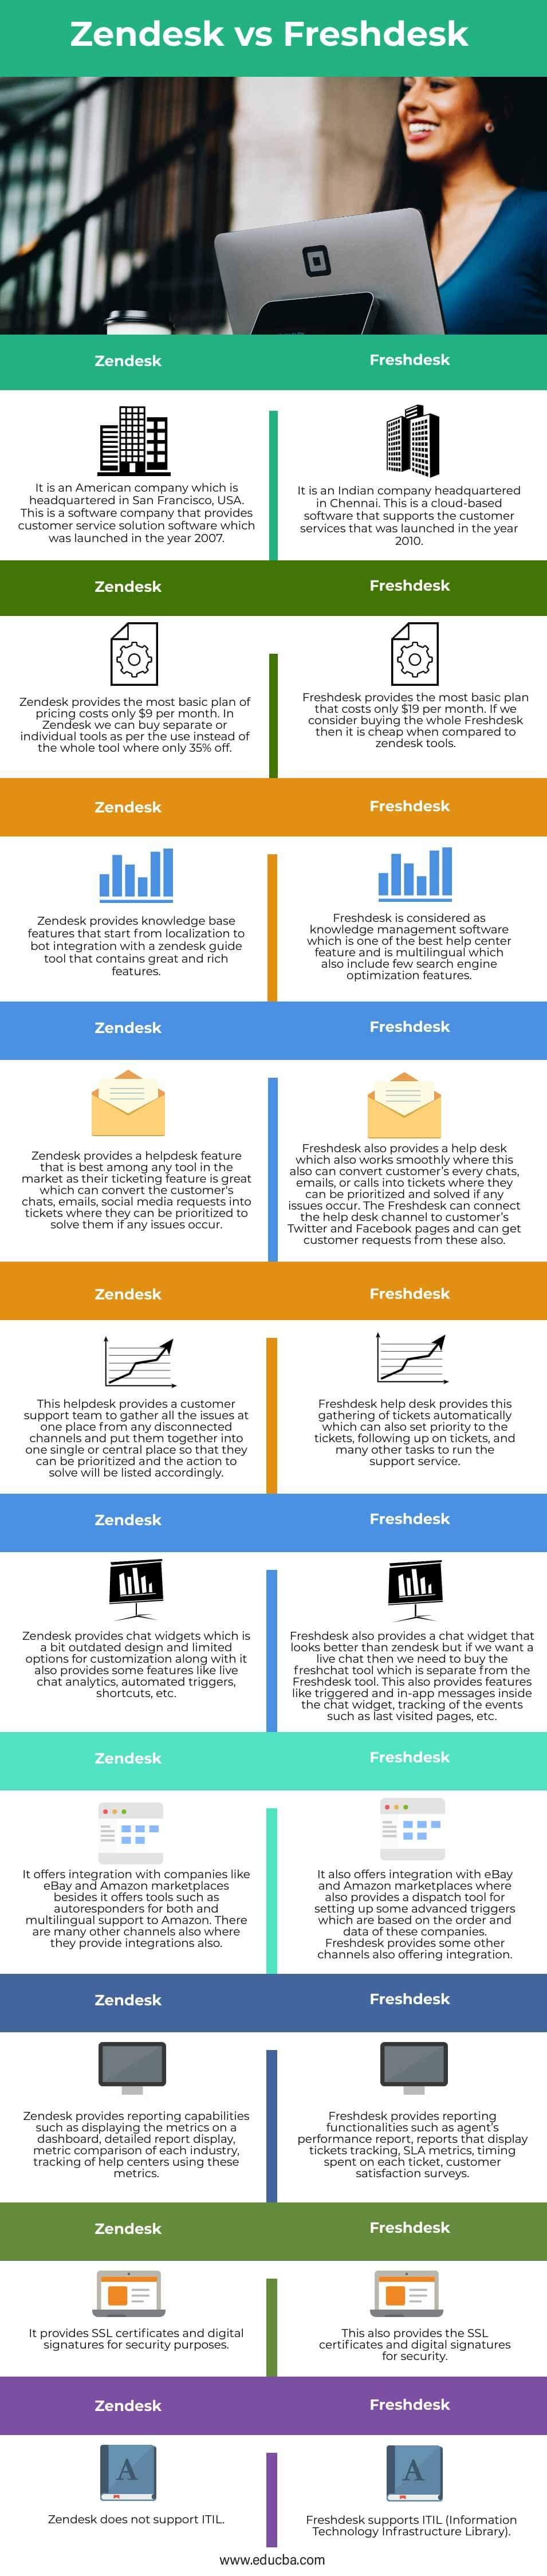 Zendesk-vs-Freshdesk-info